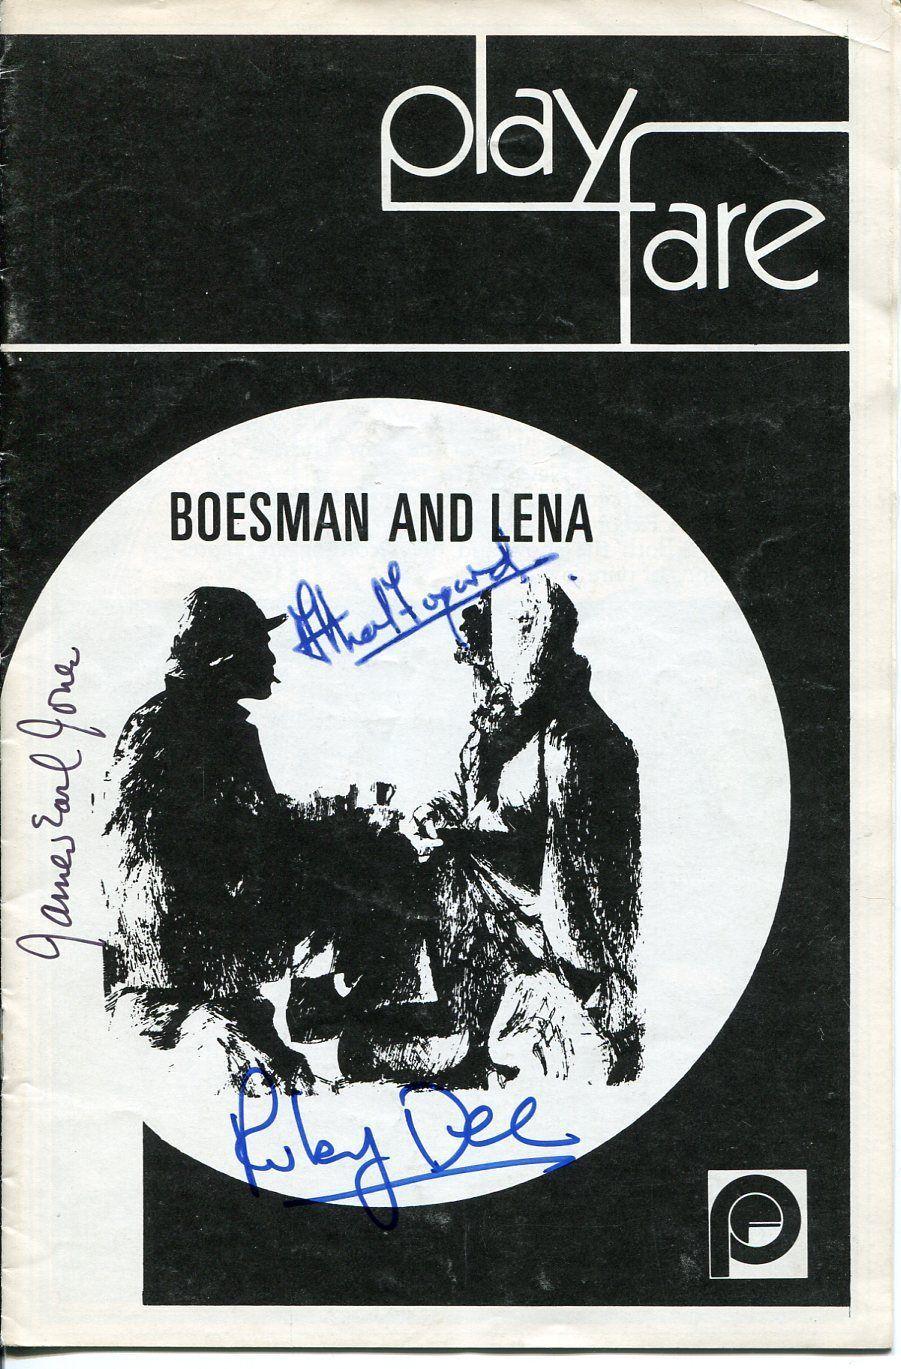 James Earl Jones Athol Fugard Ruby Dee Boesman & Lena Signed Autograph Playbill